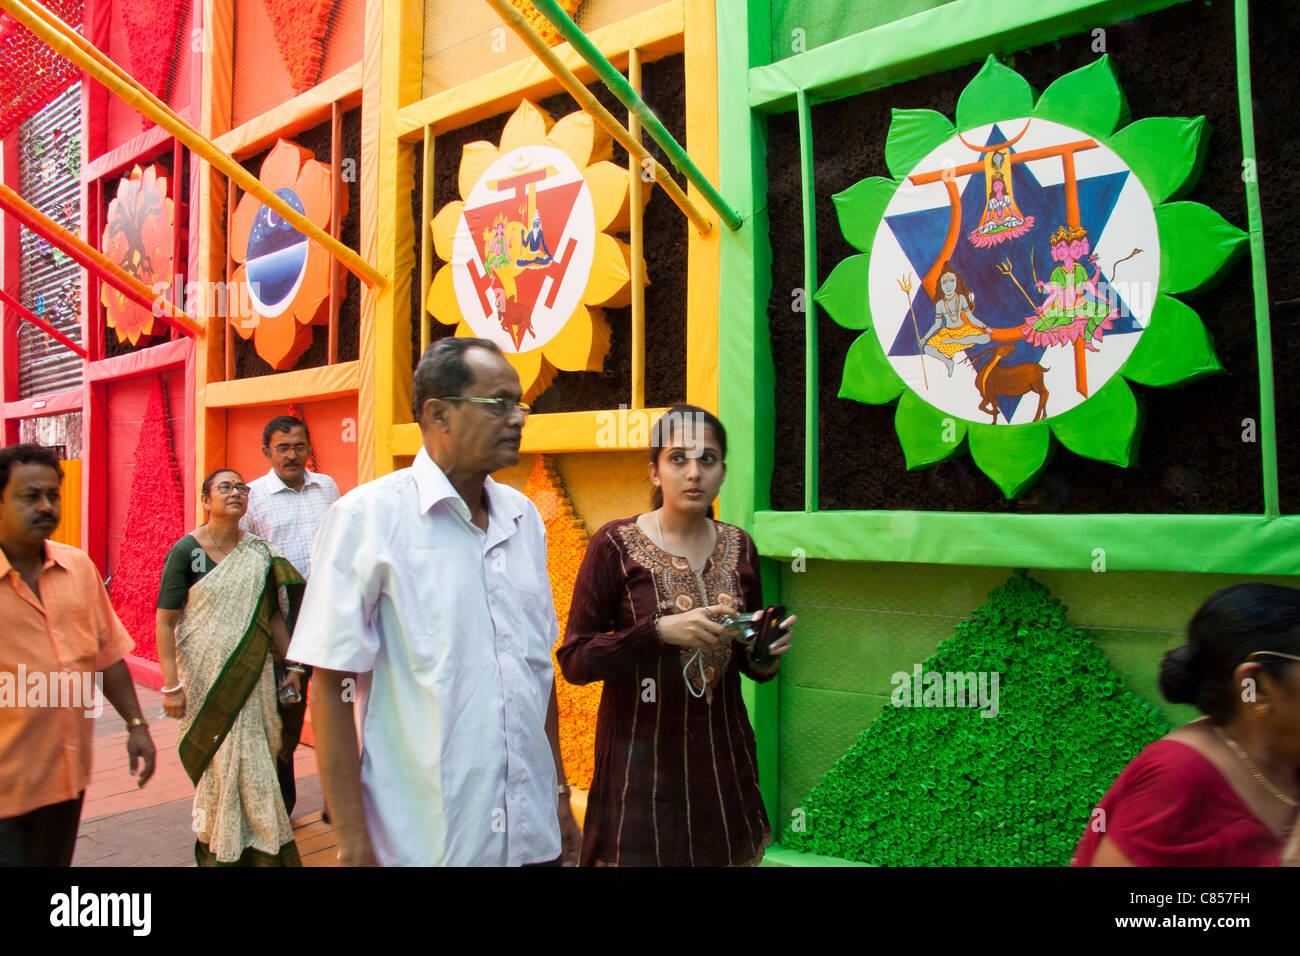 Devotees at Vivekanand Park Athletic Club Durga Puja pandal in Haridevpur, Kolkata (Calcutta), West Bengal, India. - Stock Image